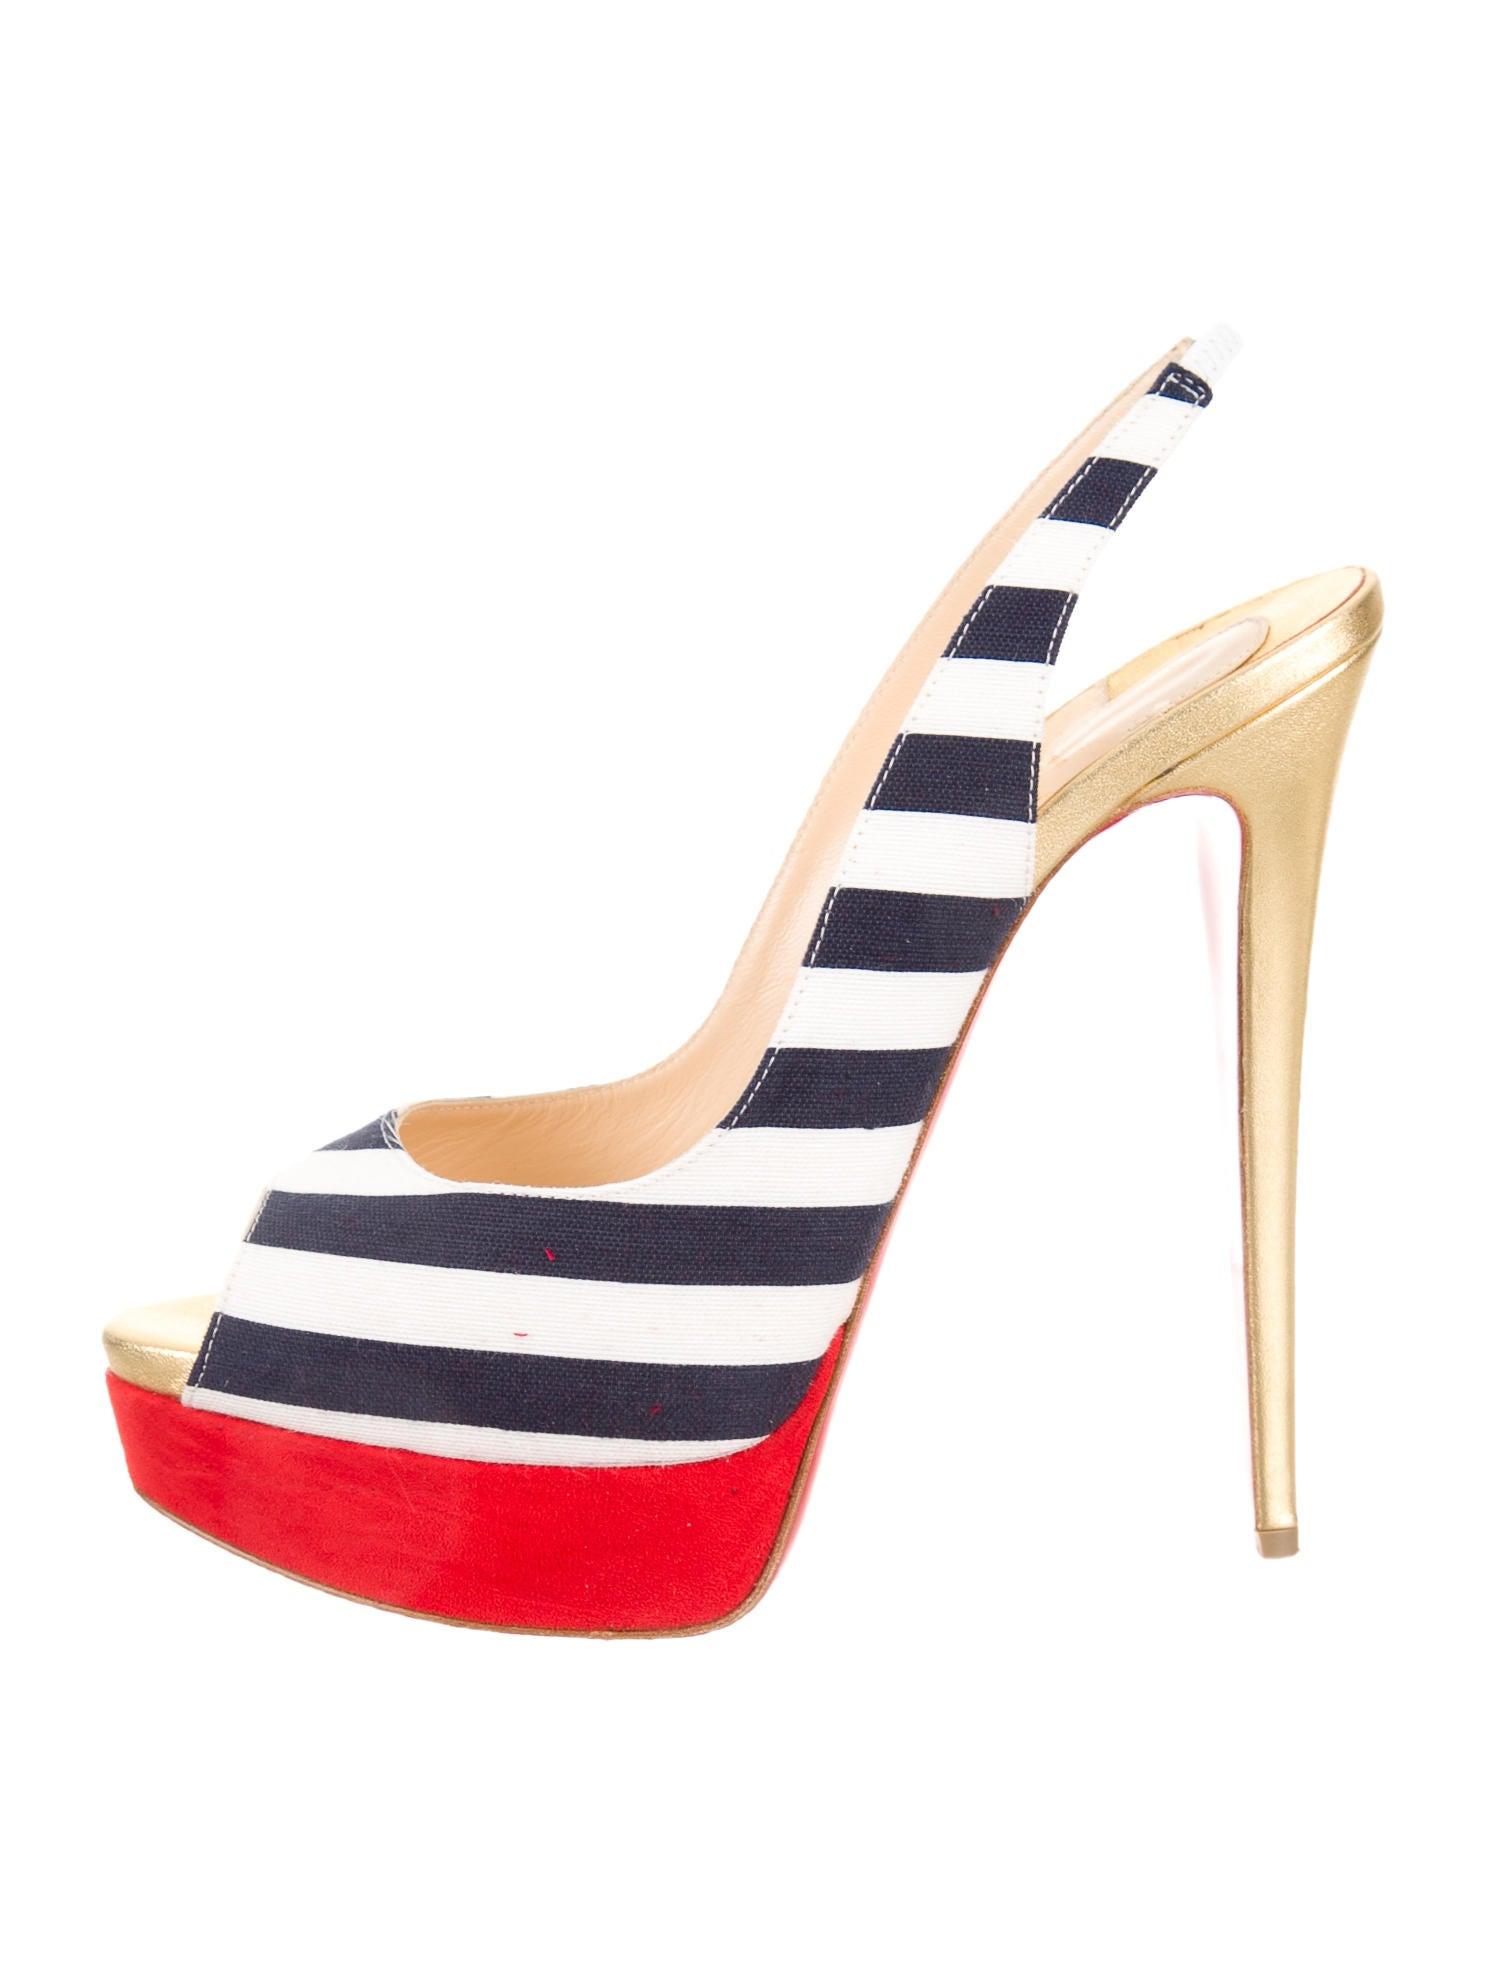 Artesur ? christian louboutin peep-toe slingback pumps Red and ...